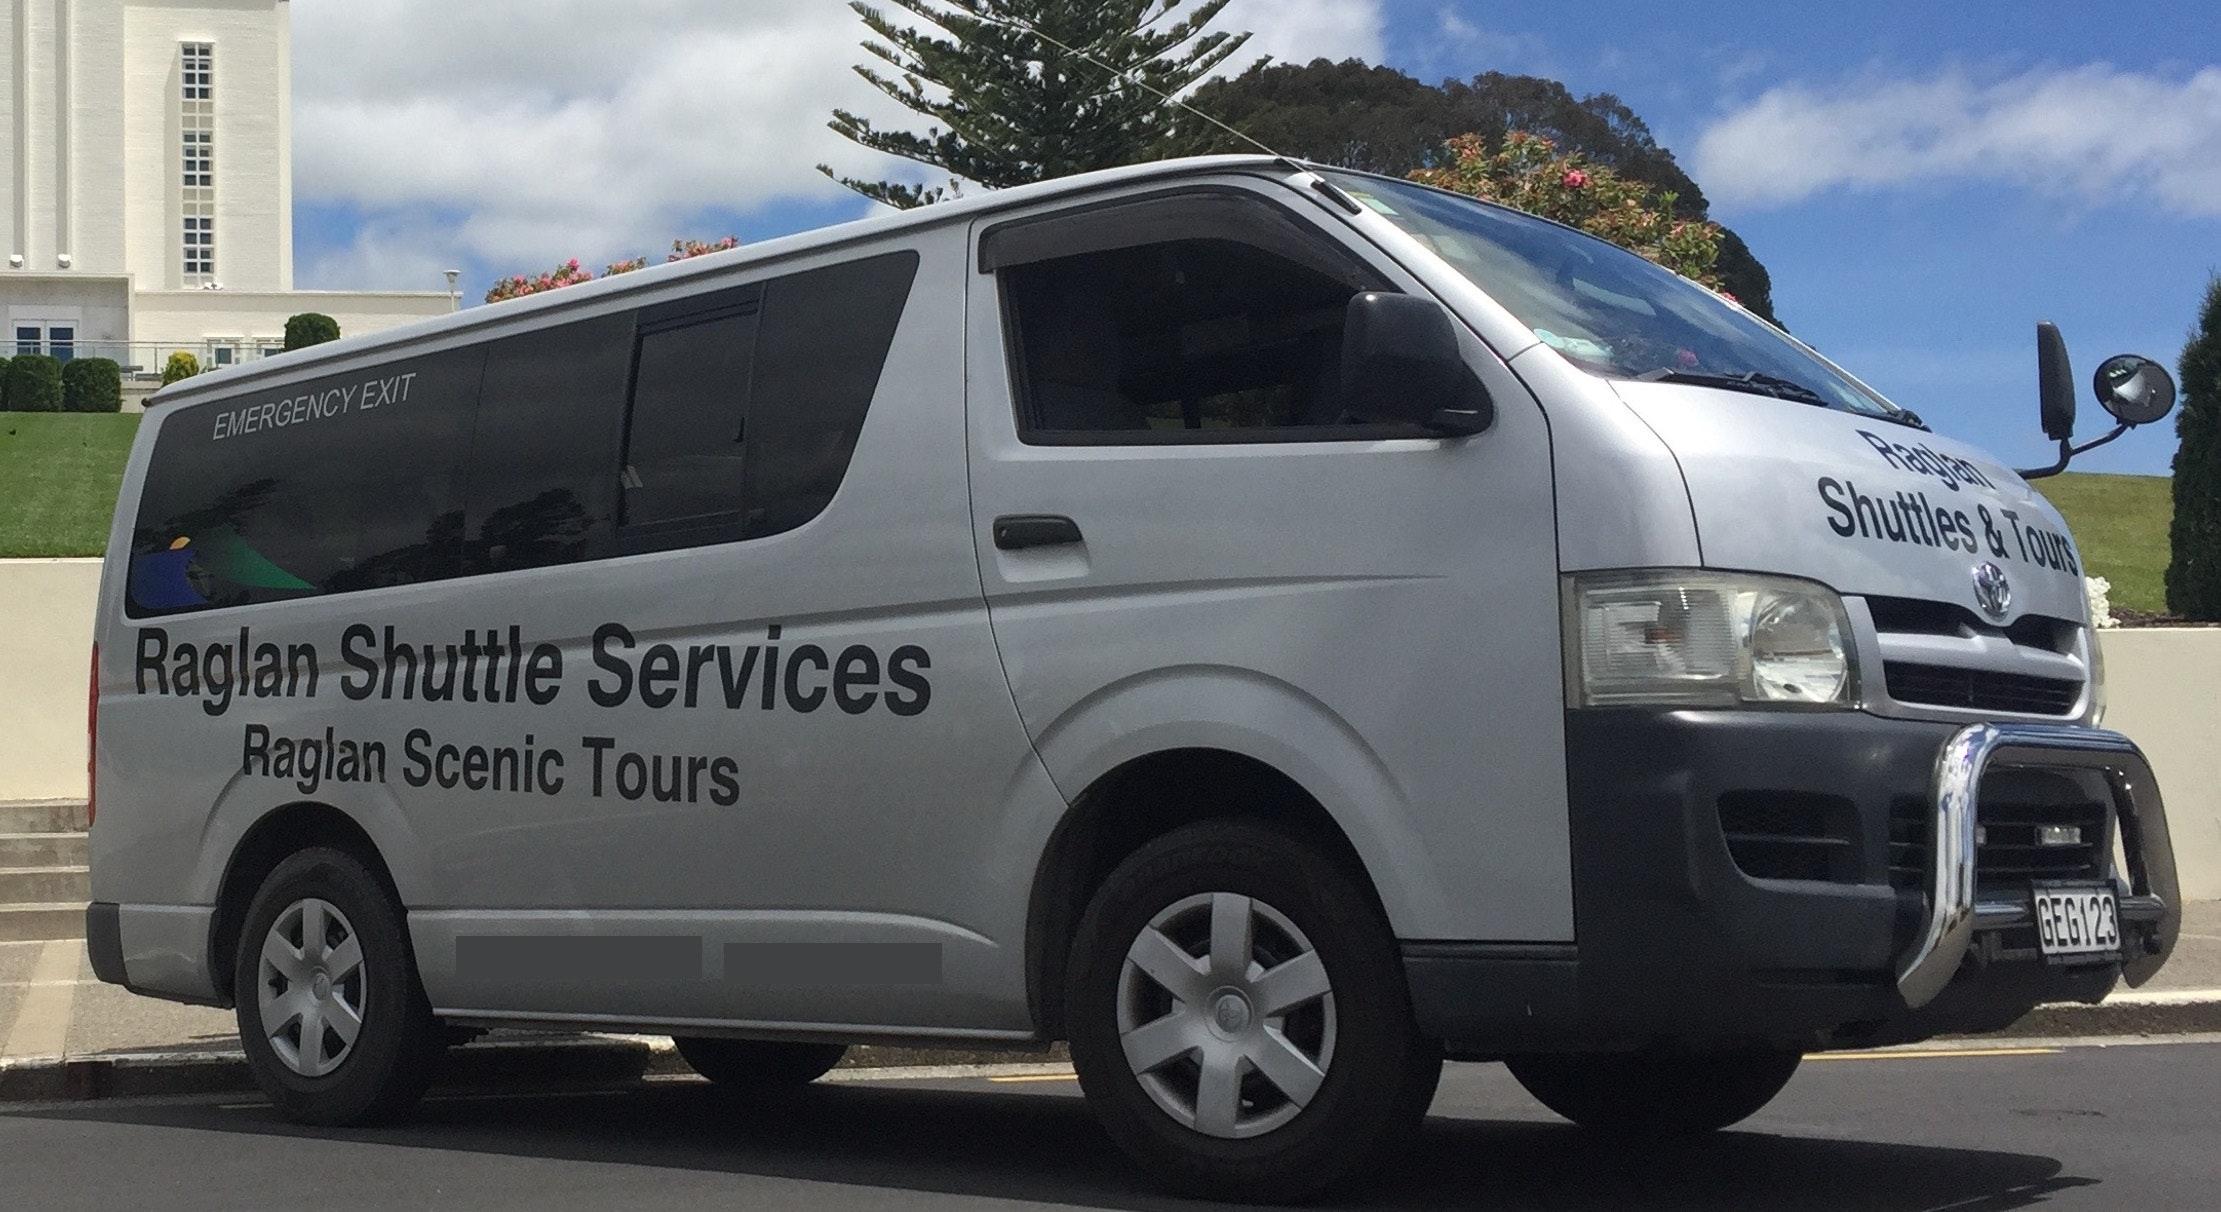 Raglan Scenic Tours & Raglan Shuttle Service